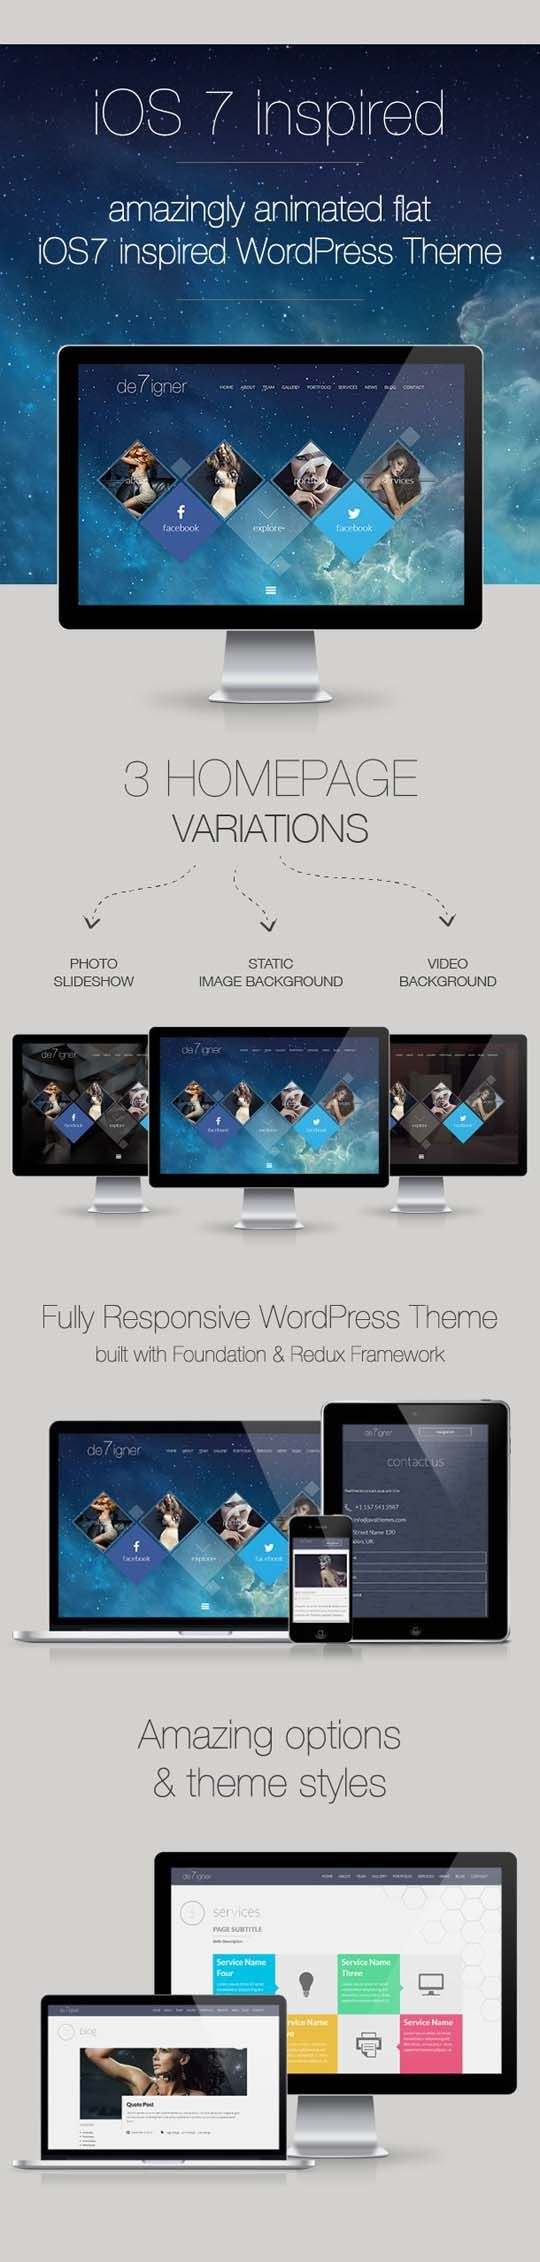 wedding invitation template themeforest%0A De igner  u     Flat iOS  Inspired OnePage Parallax Theme